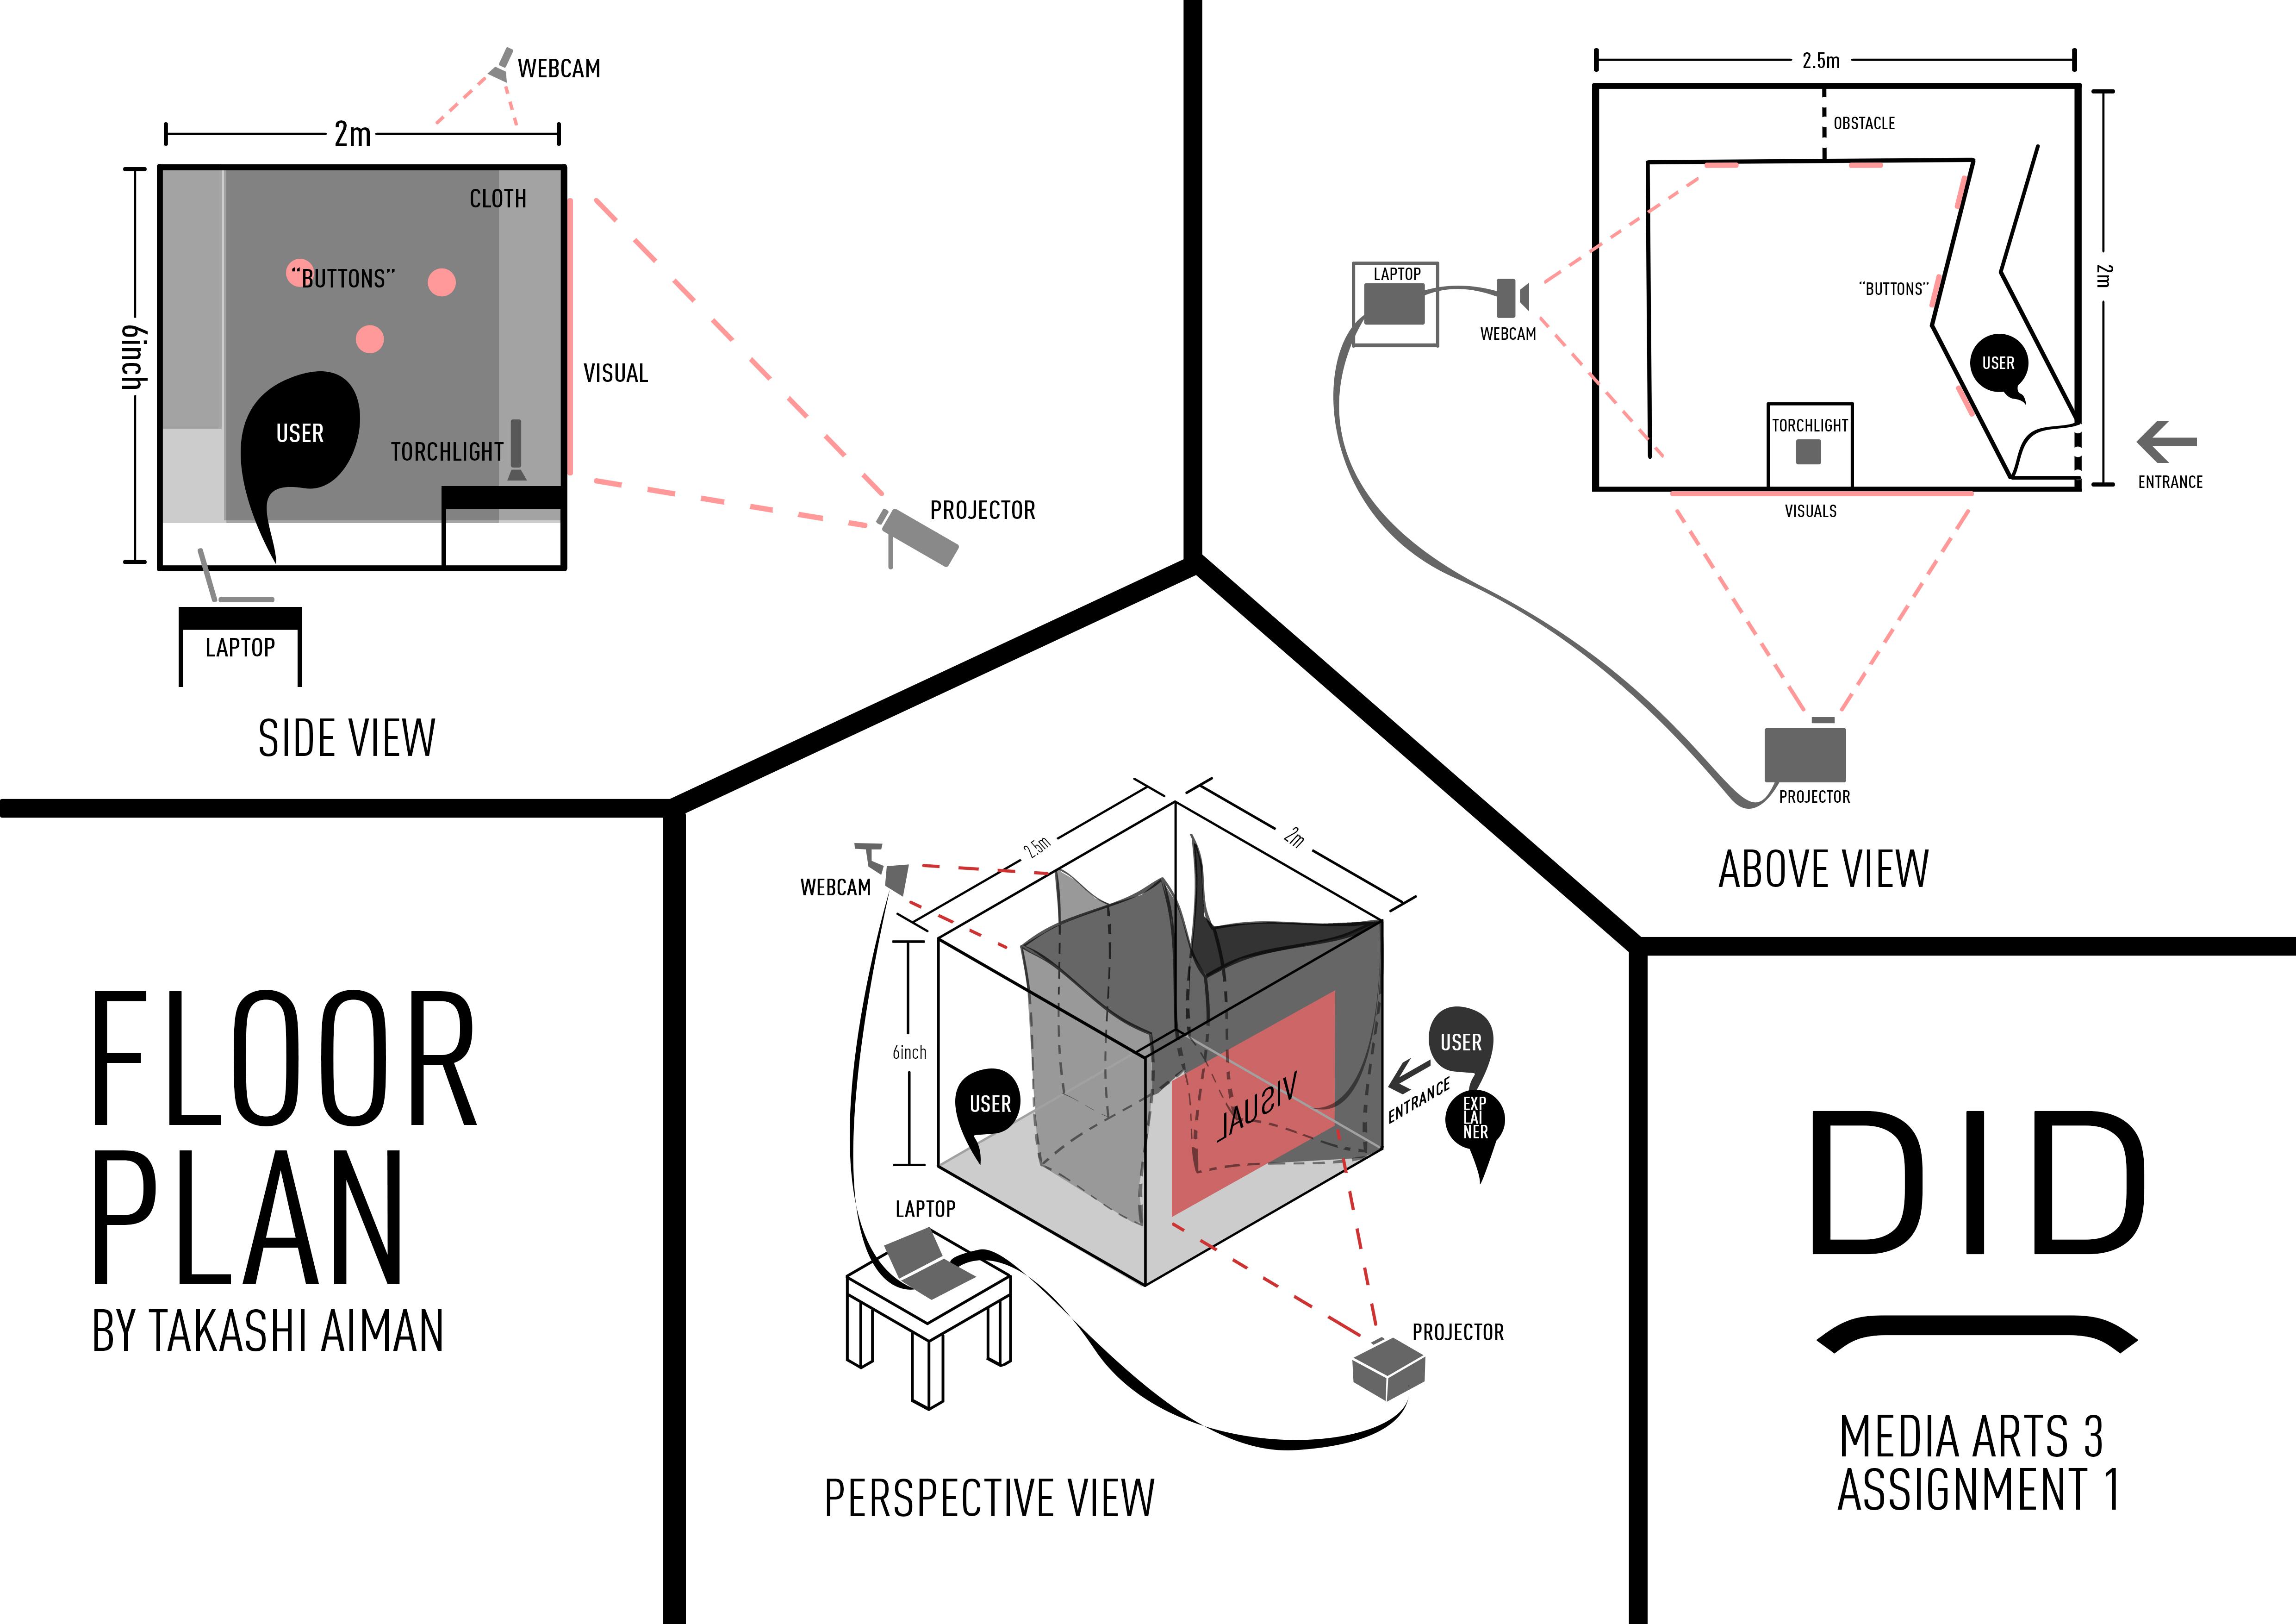 D.I.D. floor plan